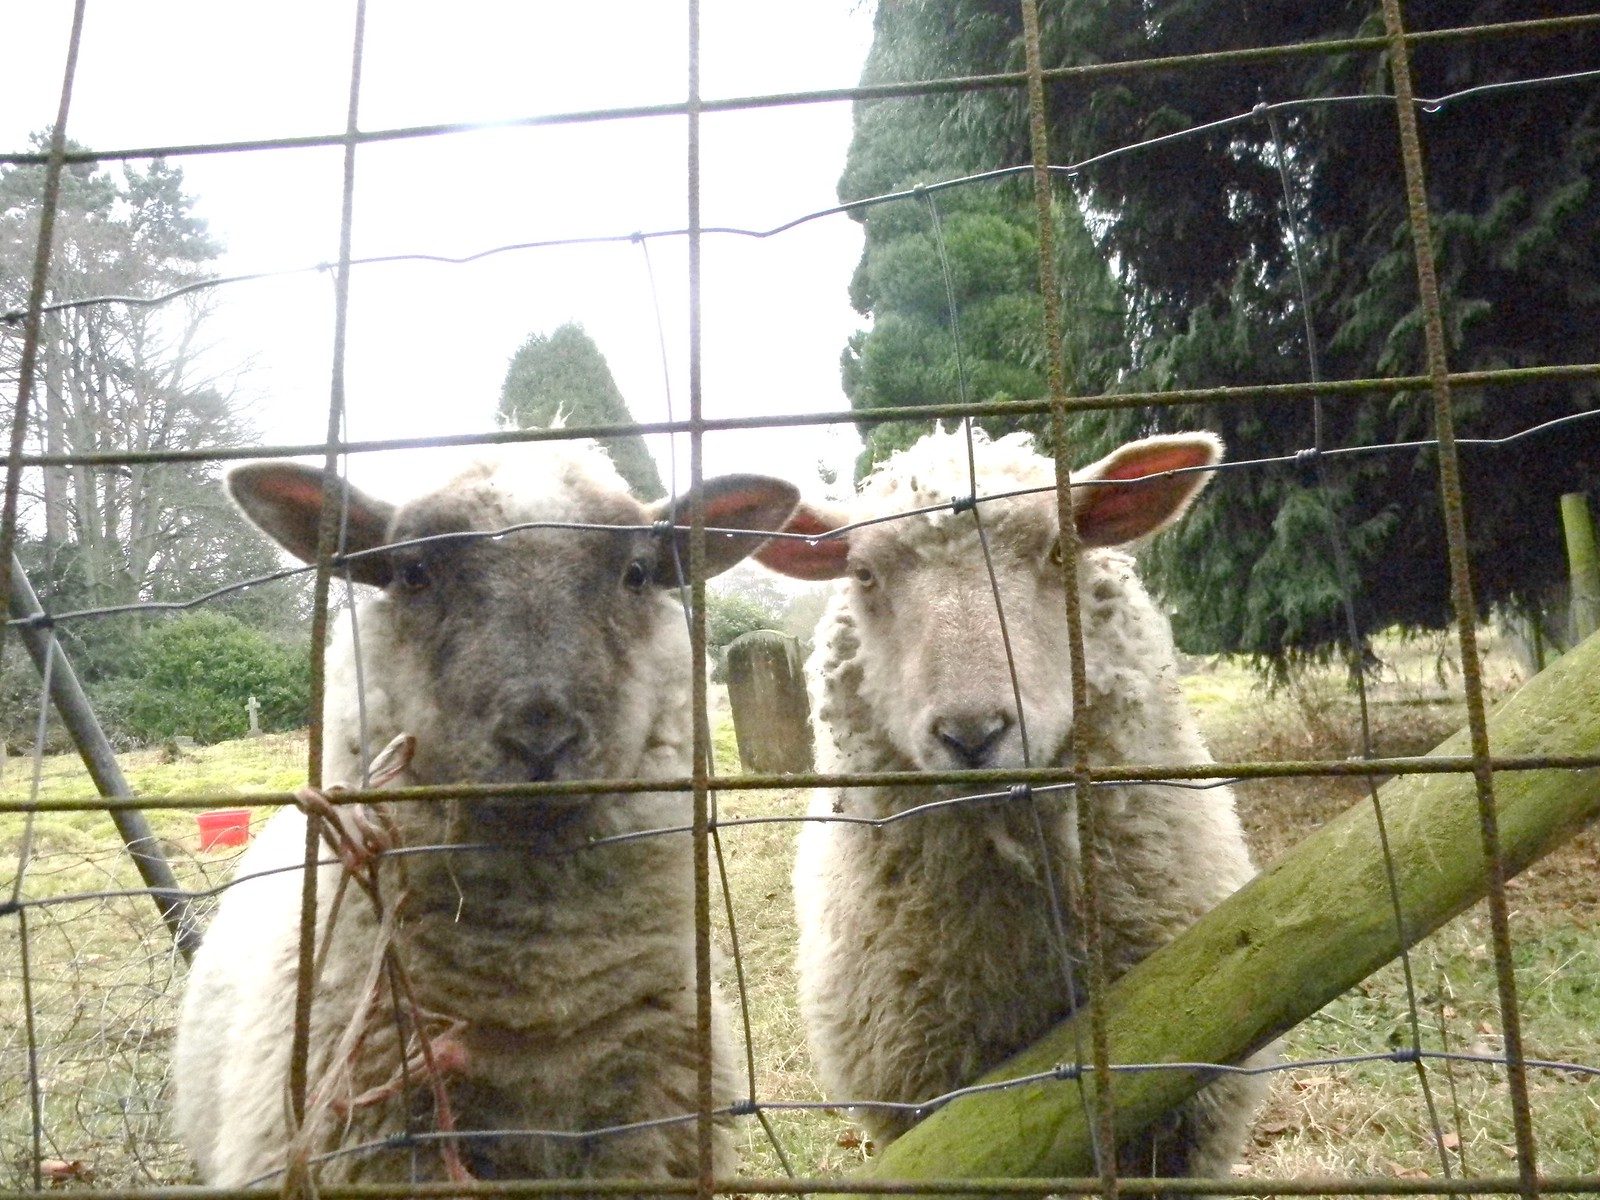 The graveyard shift Sheep, Cudham churchyard. Hayes to Knockholt